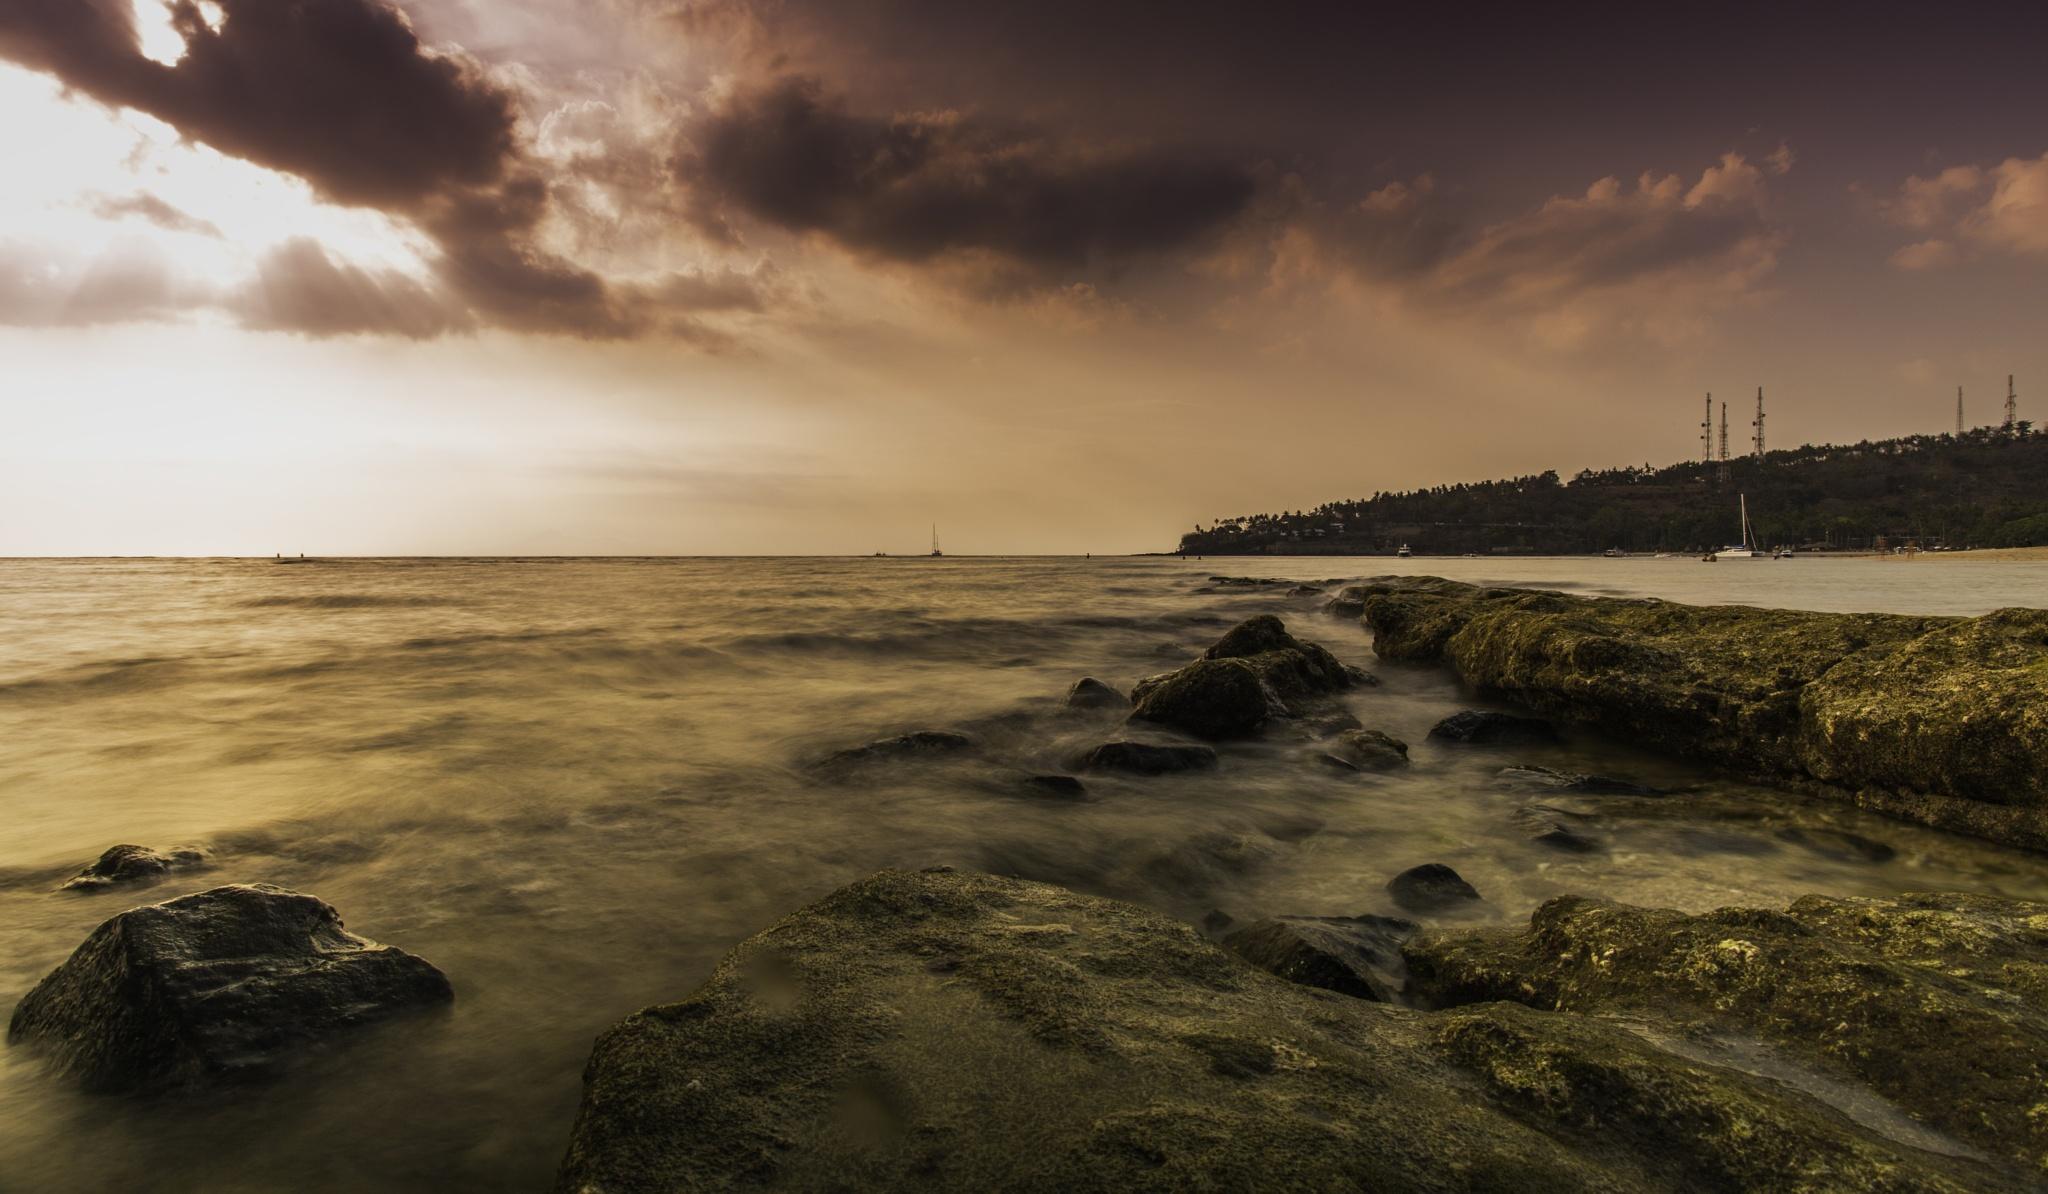 karang pantai sengigi by Syafri Gamal